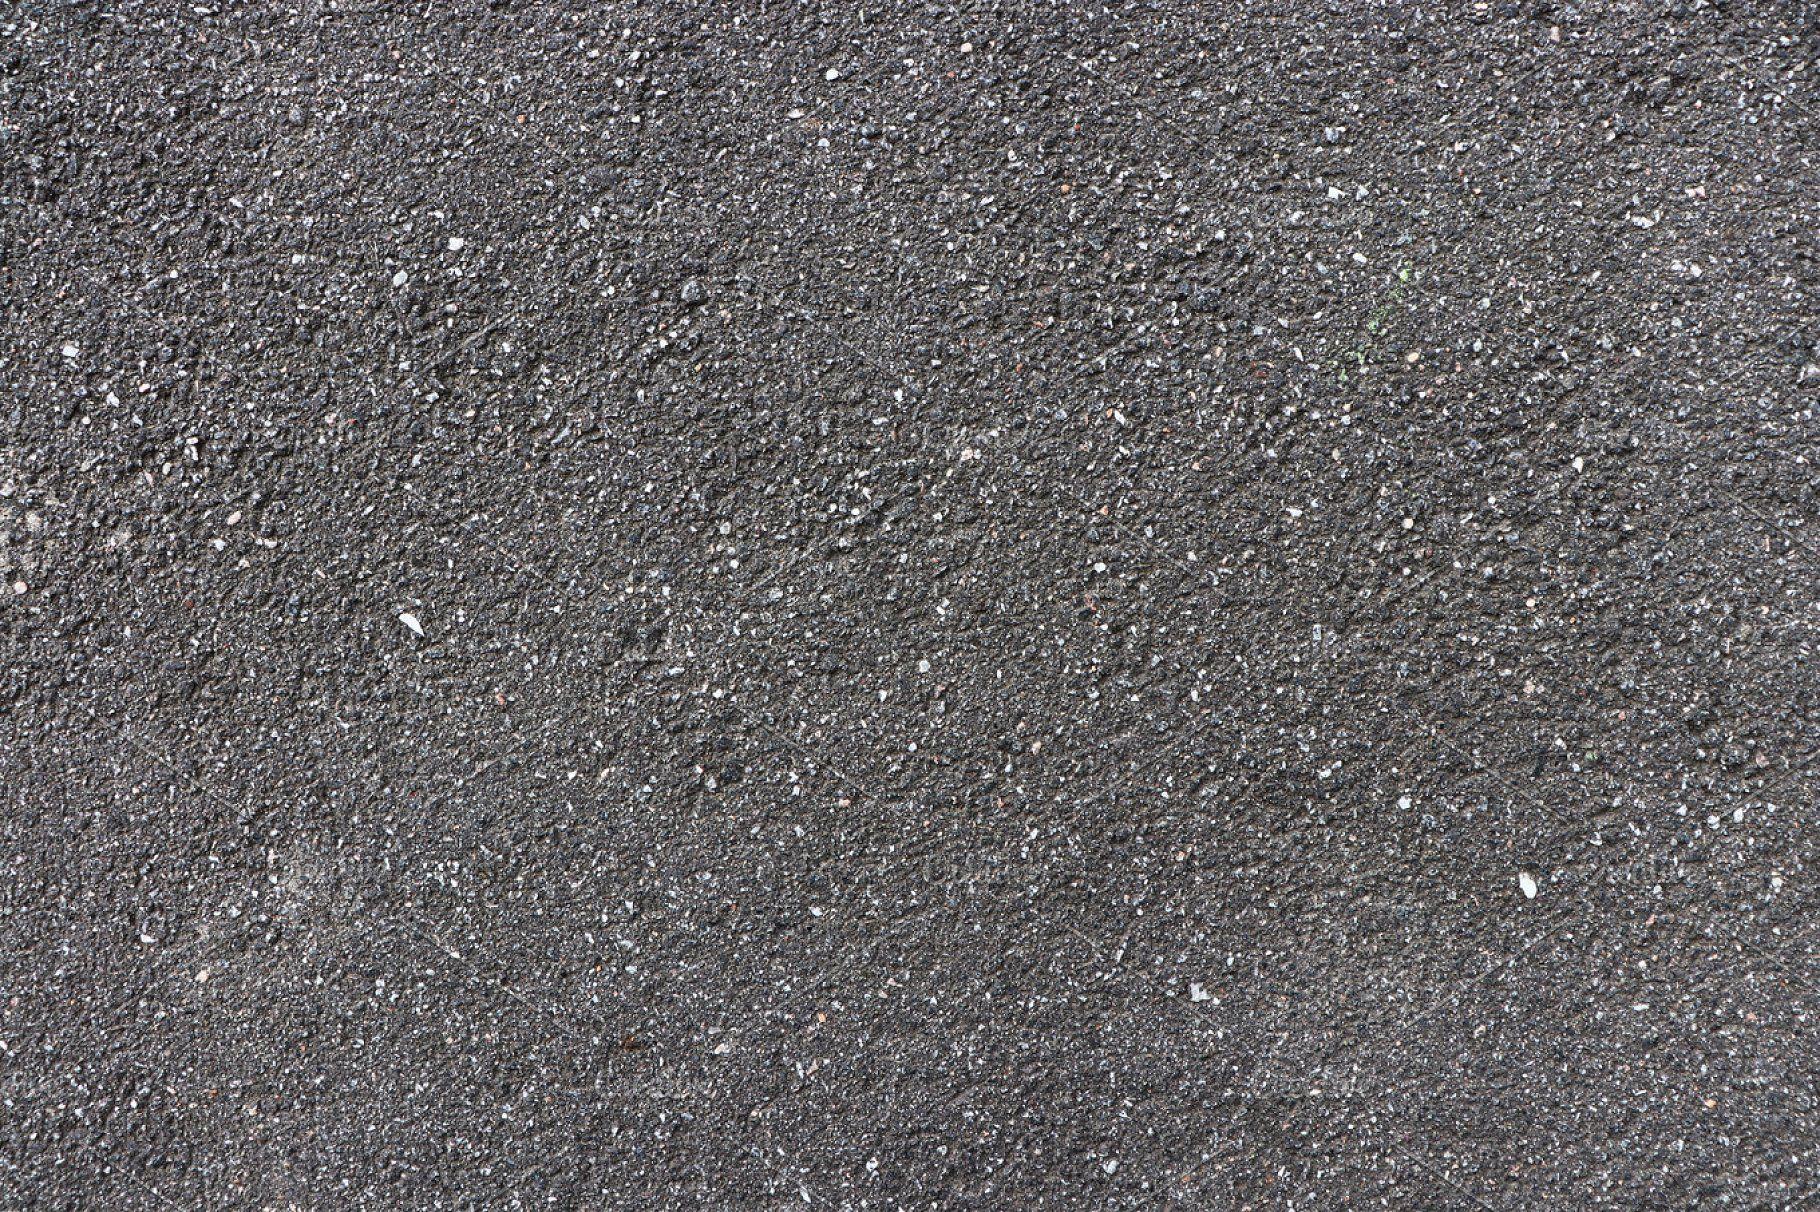 Road Asphalt Texture Asphalt Texture Road Texture Photoshop Textures